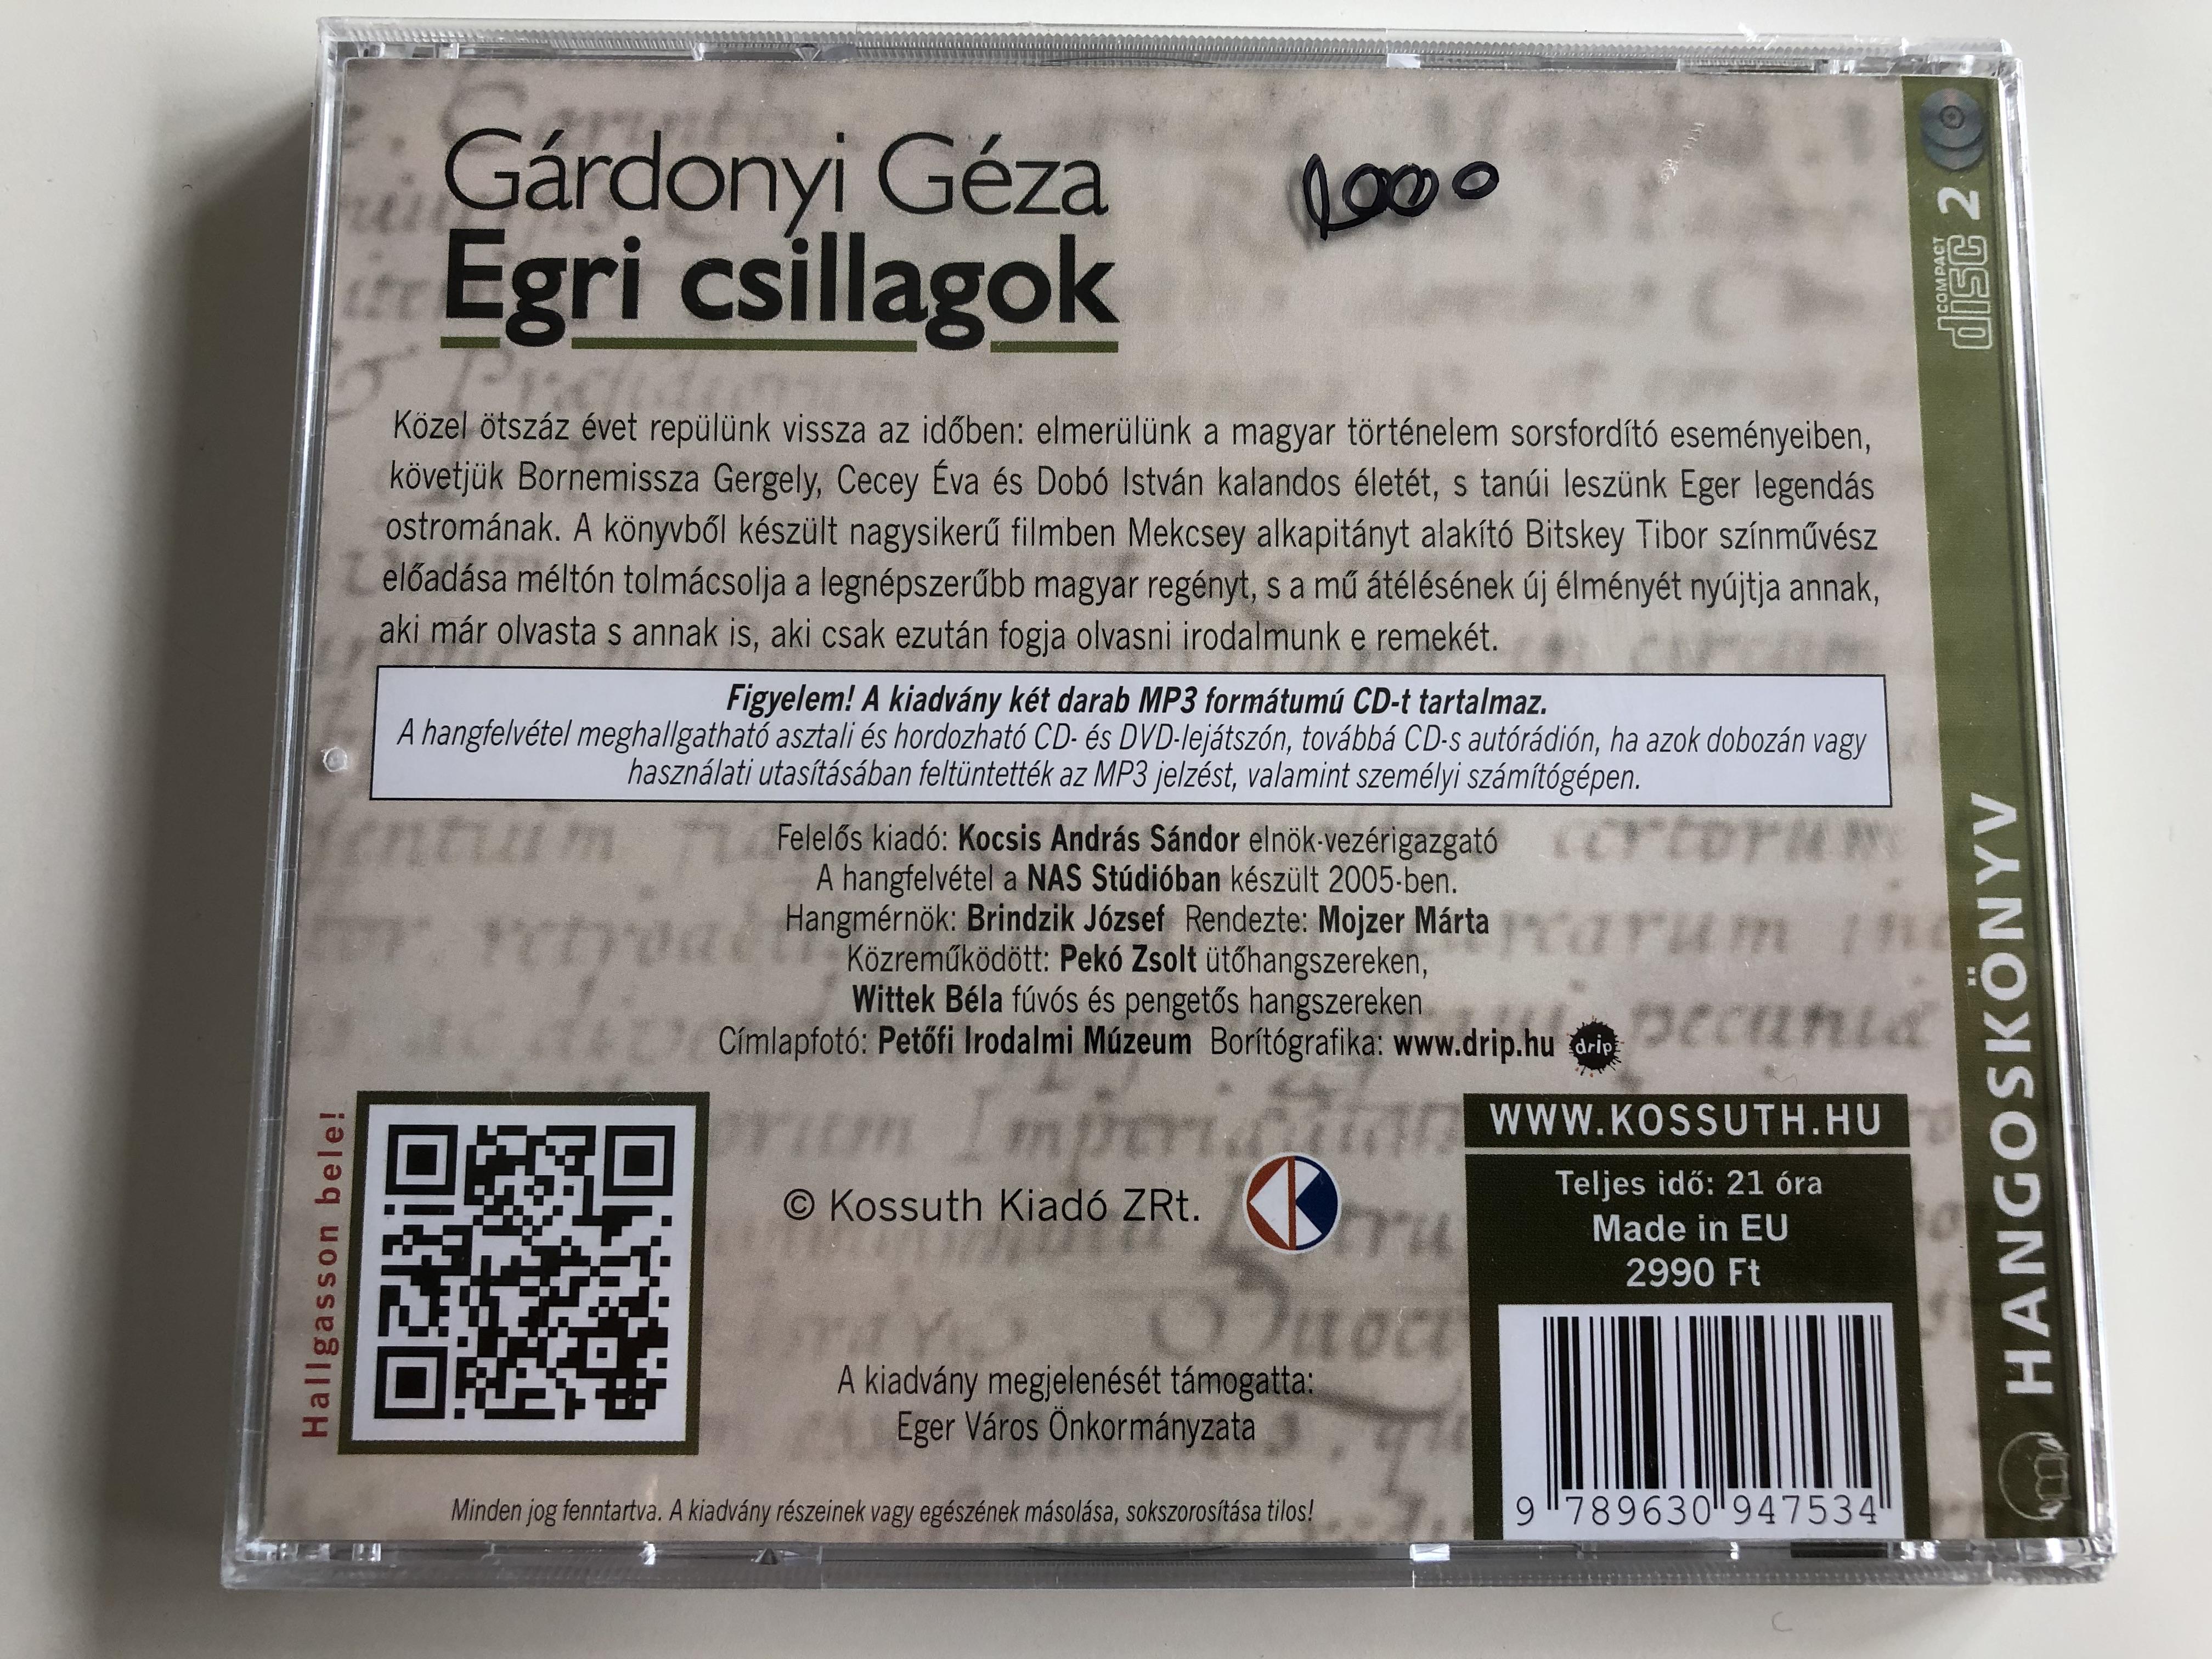 g-rdonyi-g-za-egri-csillagok-hangosk-nyv-2-mp3-cd-read-by-bitskey-tibor-el-ad-s-ban-famous-hungarian-novel-audiobook-mp3-cd-2005-kossuth-kiad-2-.jpg